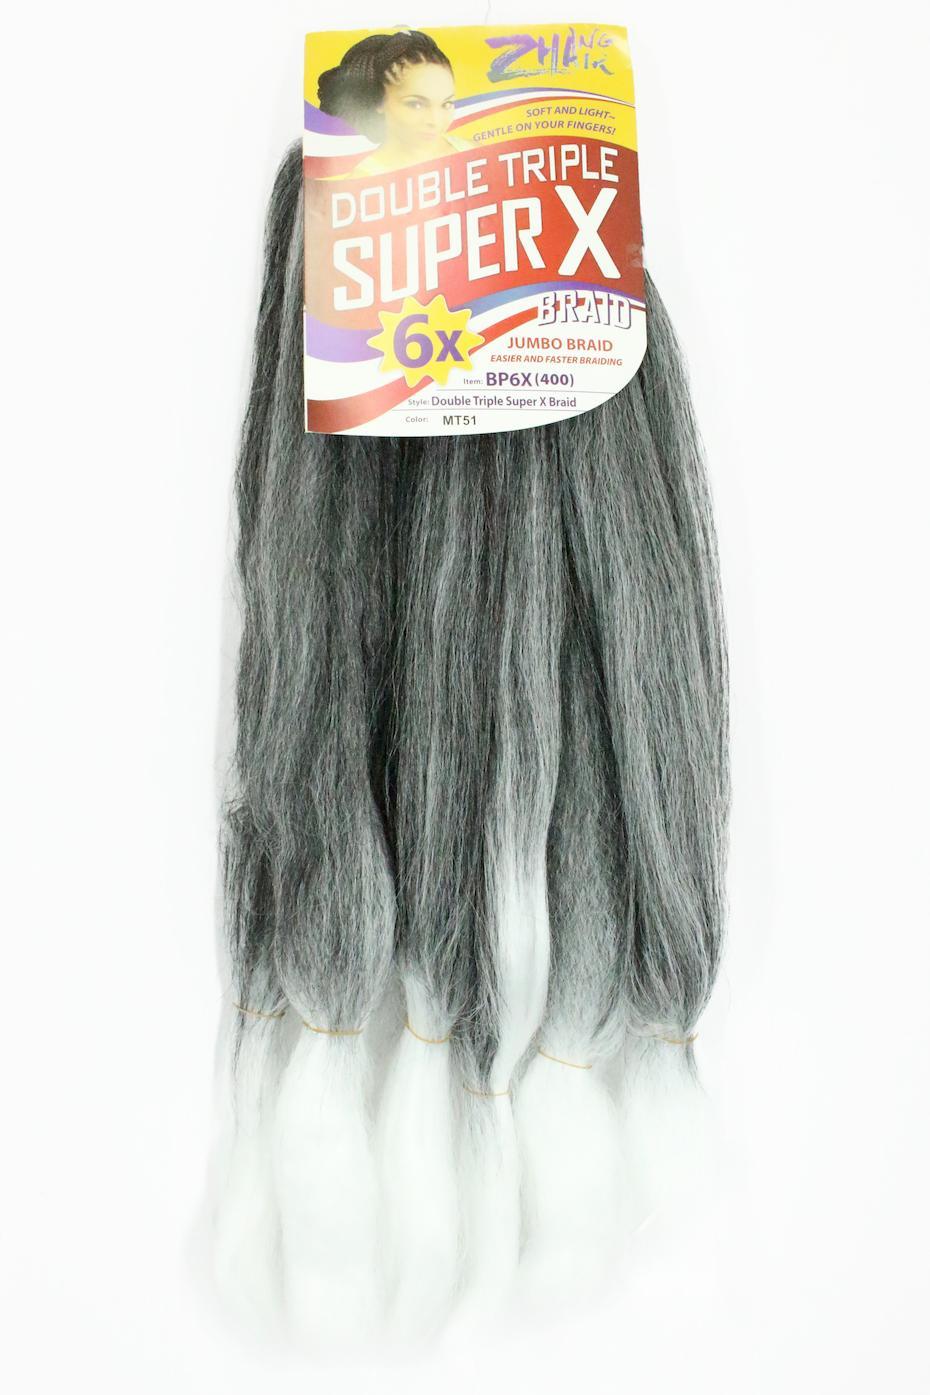 Cabelo Sintético - Zhang hair jumbo - Super X (400g) - Cor: Preto / Branco (MT51)